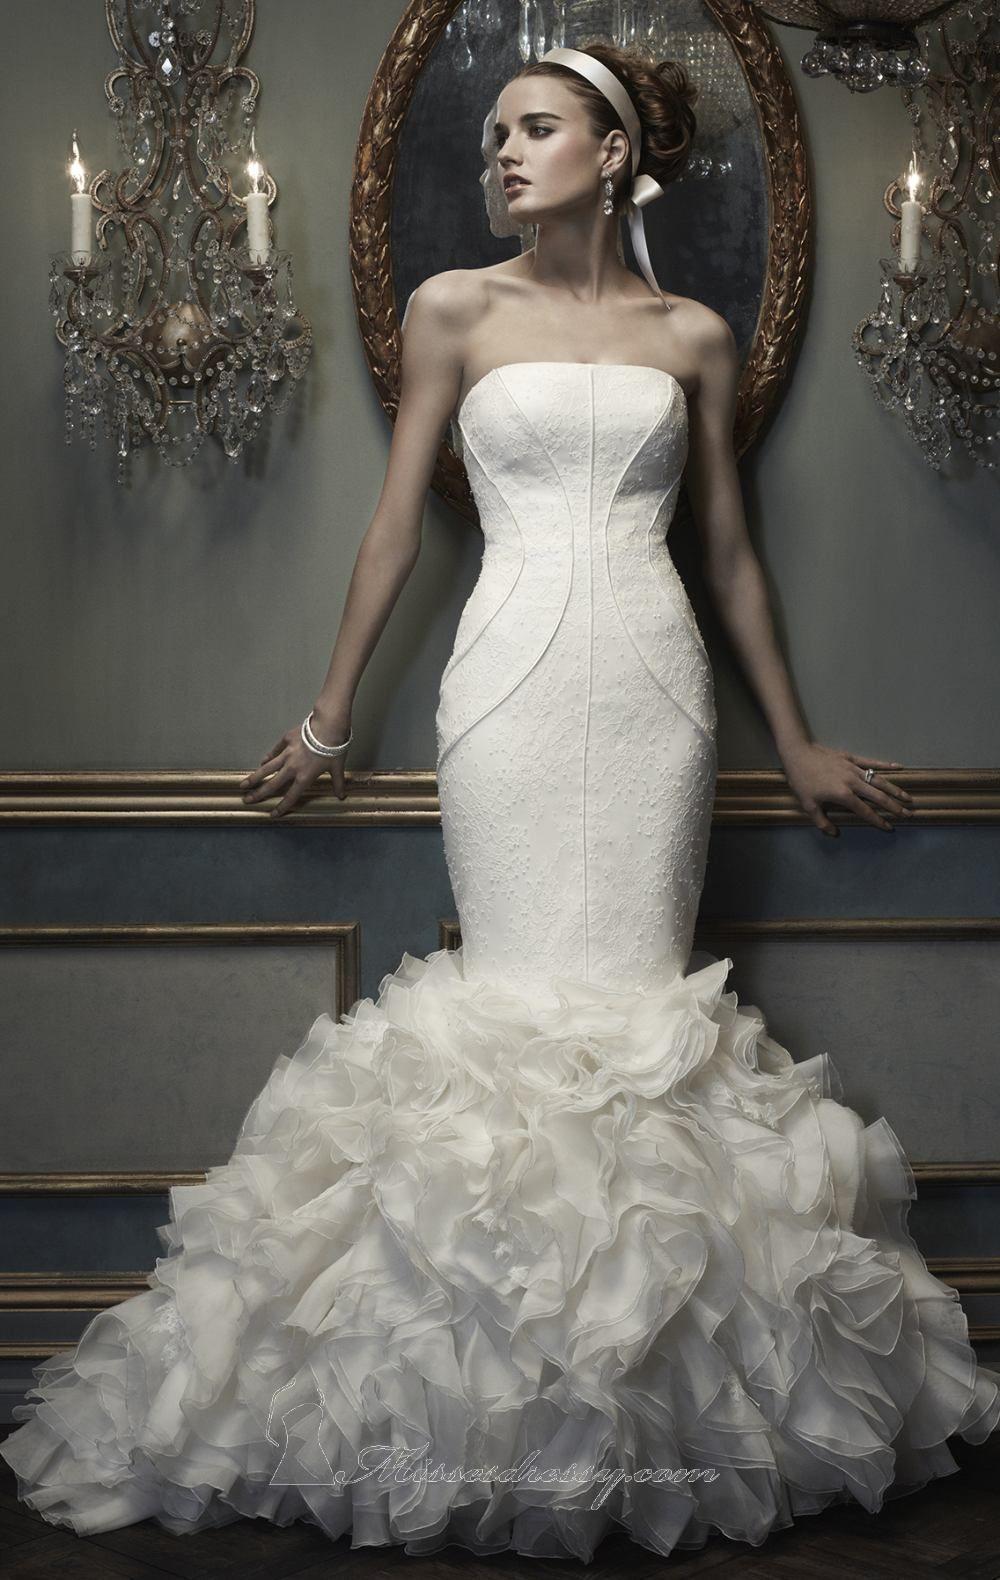 Cb couture b dress missesdressy wedding dresses